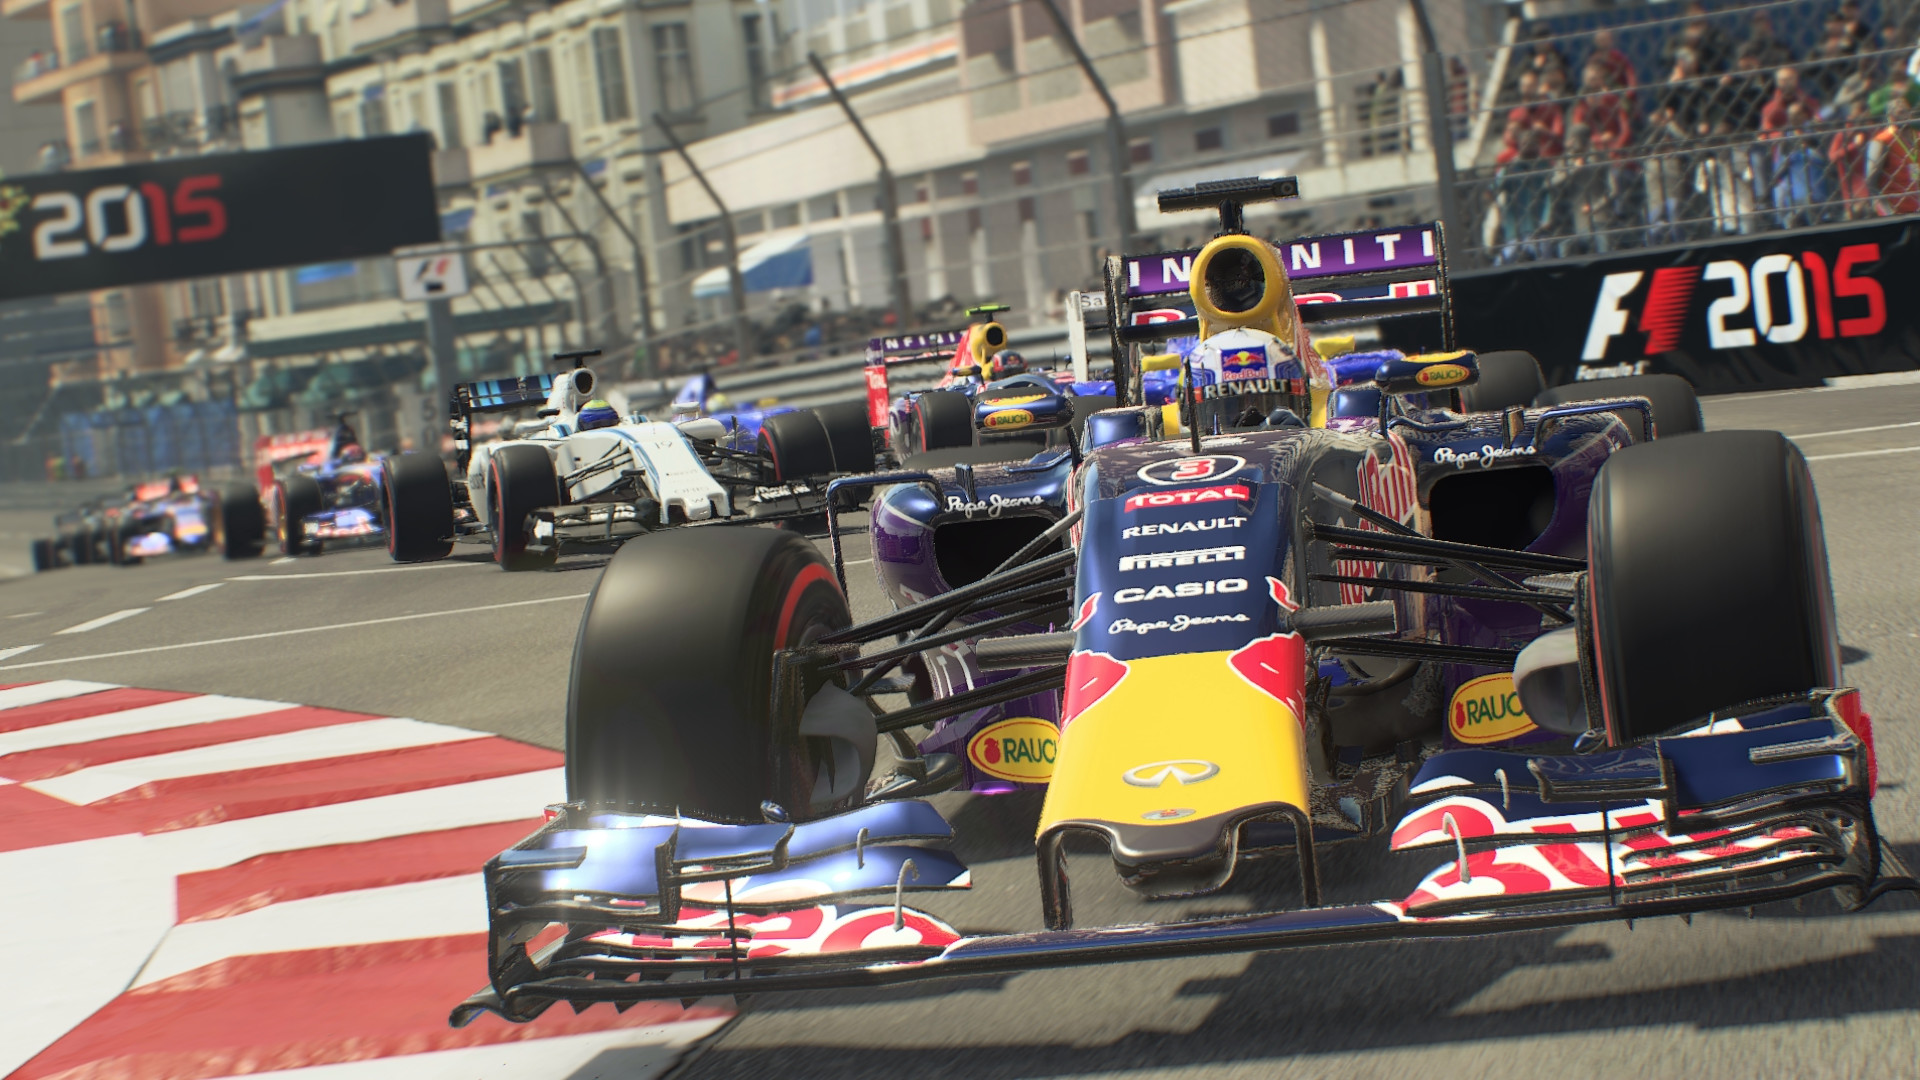 F1 2015 ESPAÑOL PC Full (CPY) + UPDATE v1.0.19.5154 + REPACK 2 DVD5 (JPW) 3